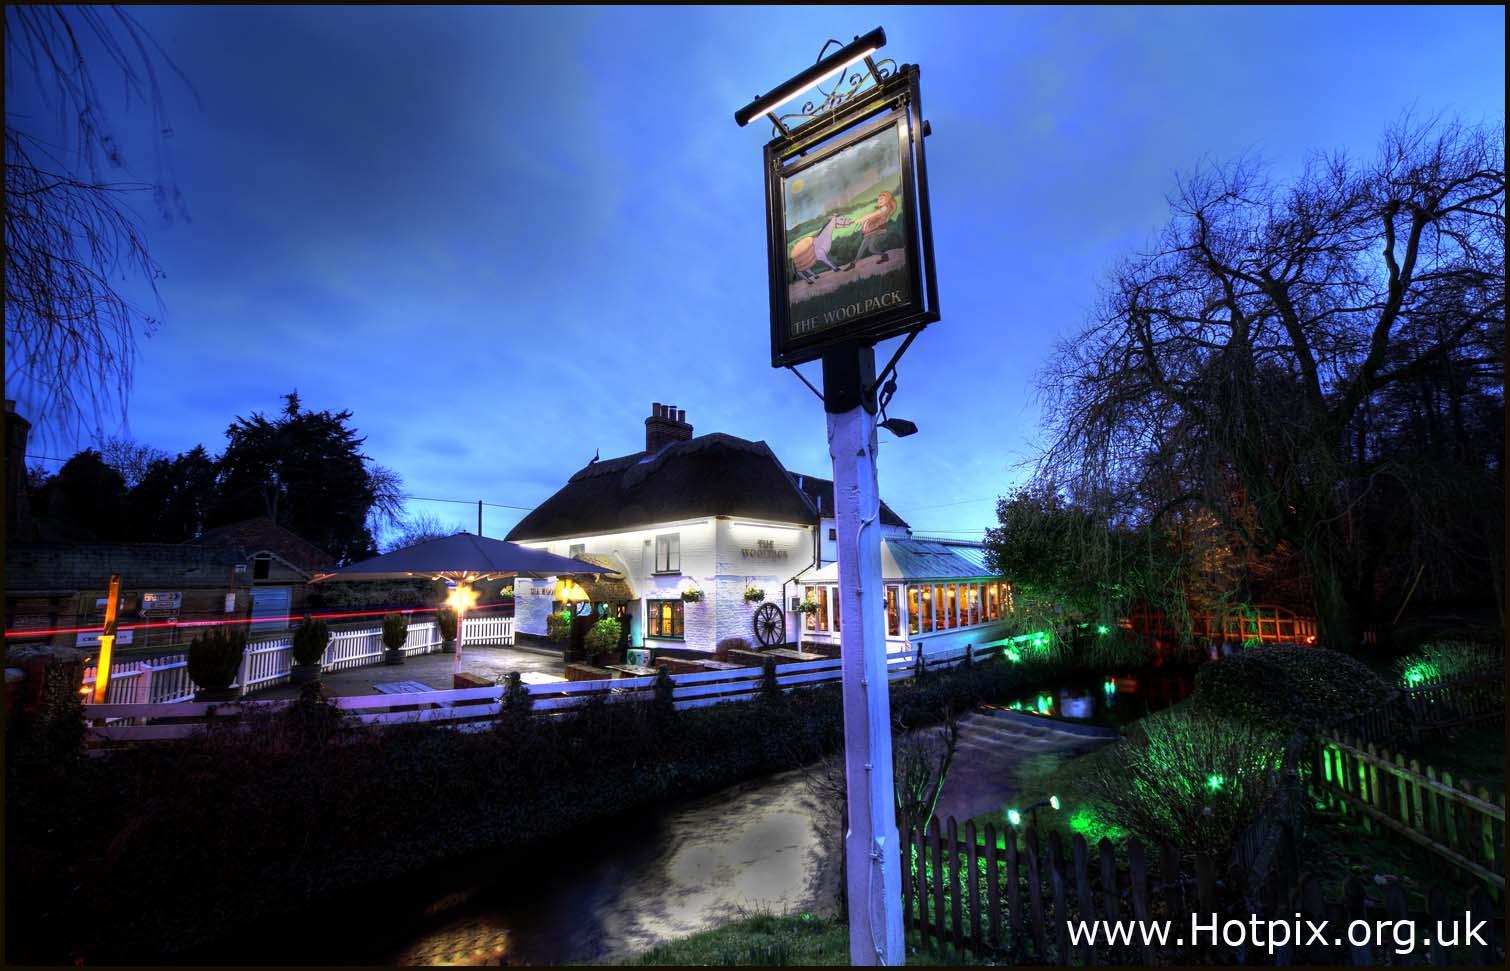 sopley,winkton,hampshire,christchurch,dorset,ringwood,beer,ales,england,traditional,pub,UK,CAMRA,night,dusk,magic,hour,tripod,low,light,tonysmith,tony,smith,highway,road,12-24,sigma,wide angle lens,wide,favourite,pubs,public,houses,noche,nuit,hotpix!,#tonysmithhotpix